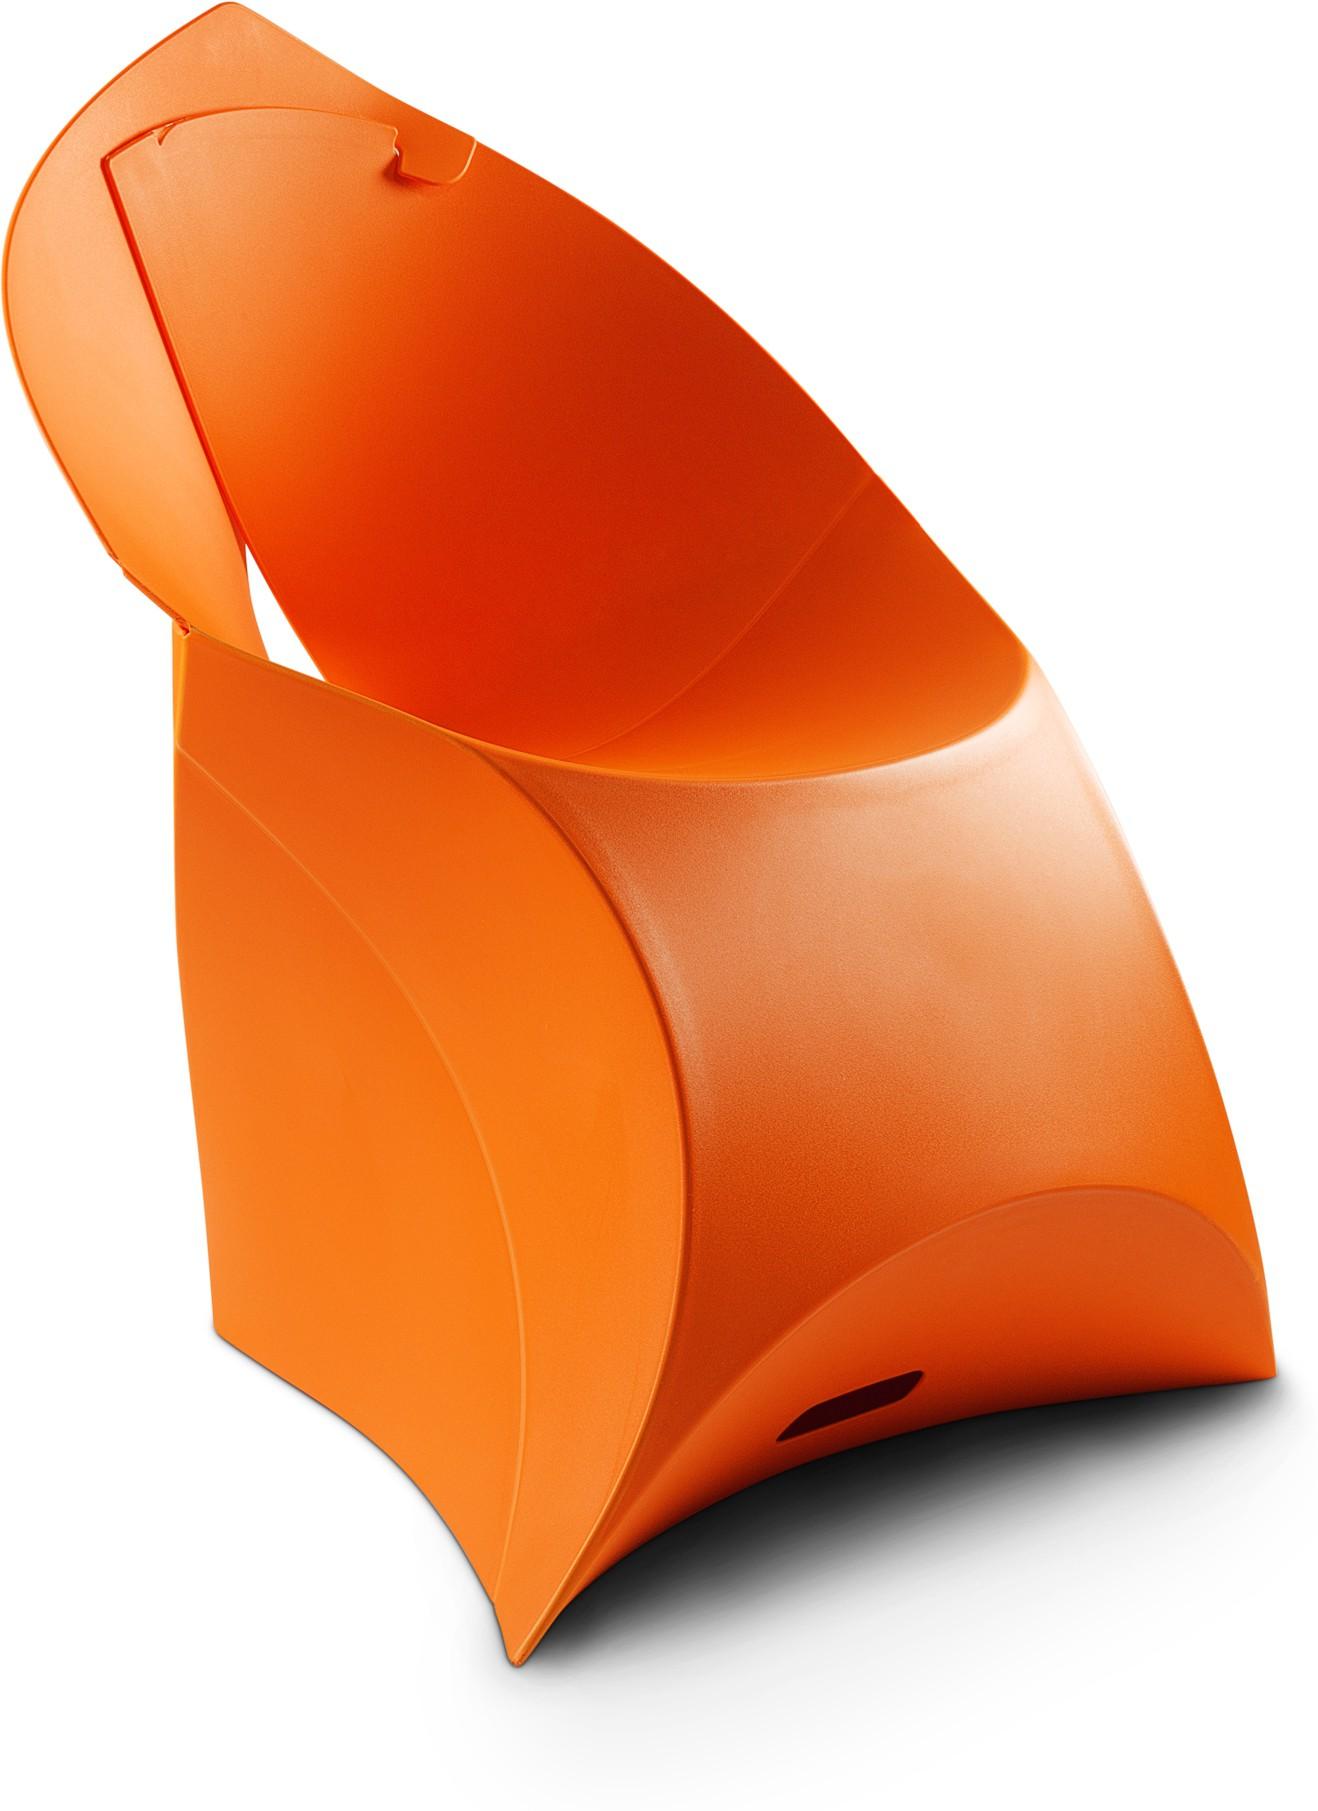 View Flux Plastic Living Room Chair(Finish Color - Bright Orange) Furniture (Flux)